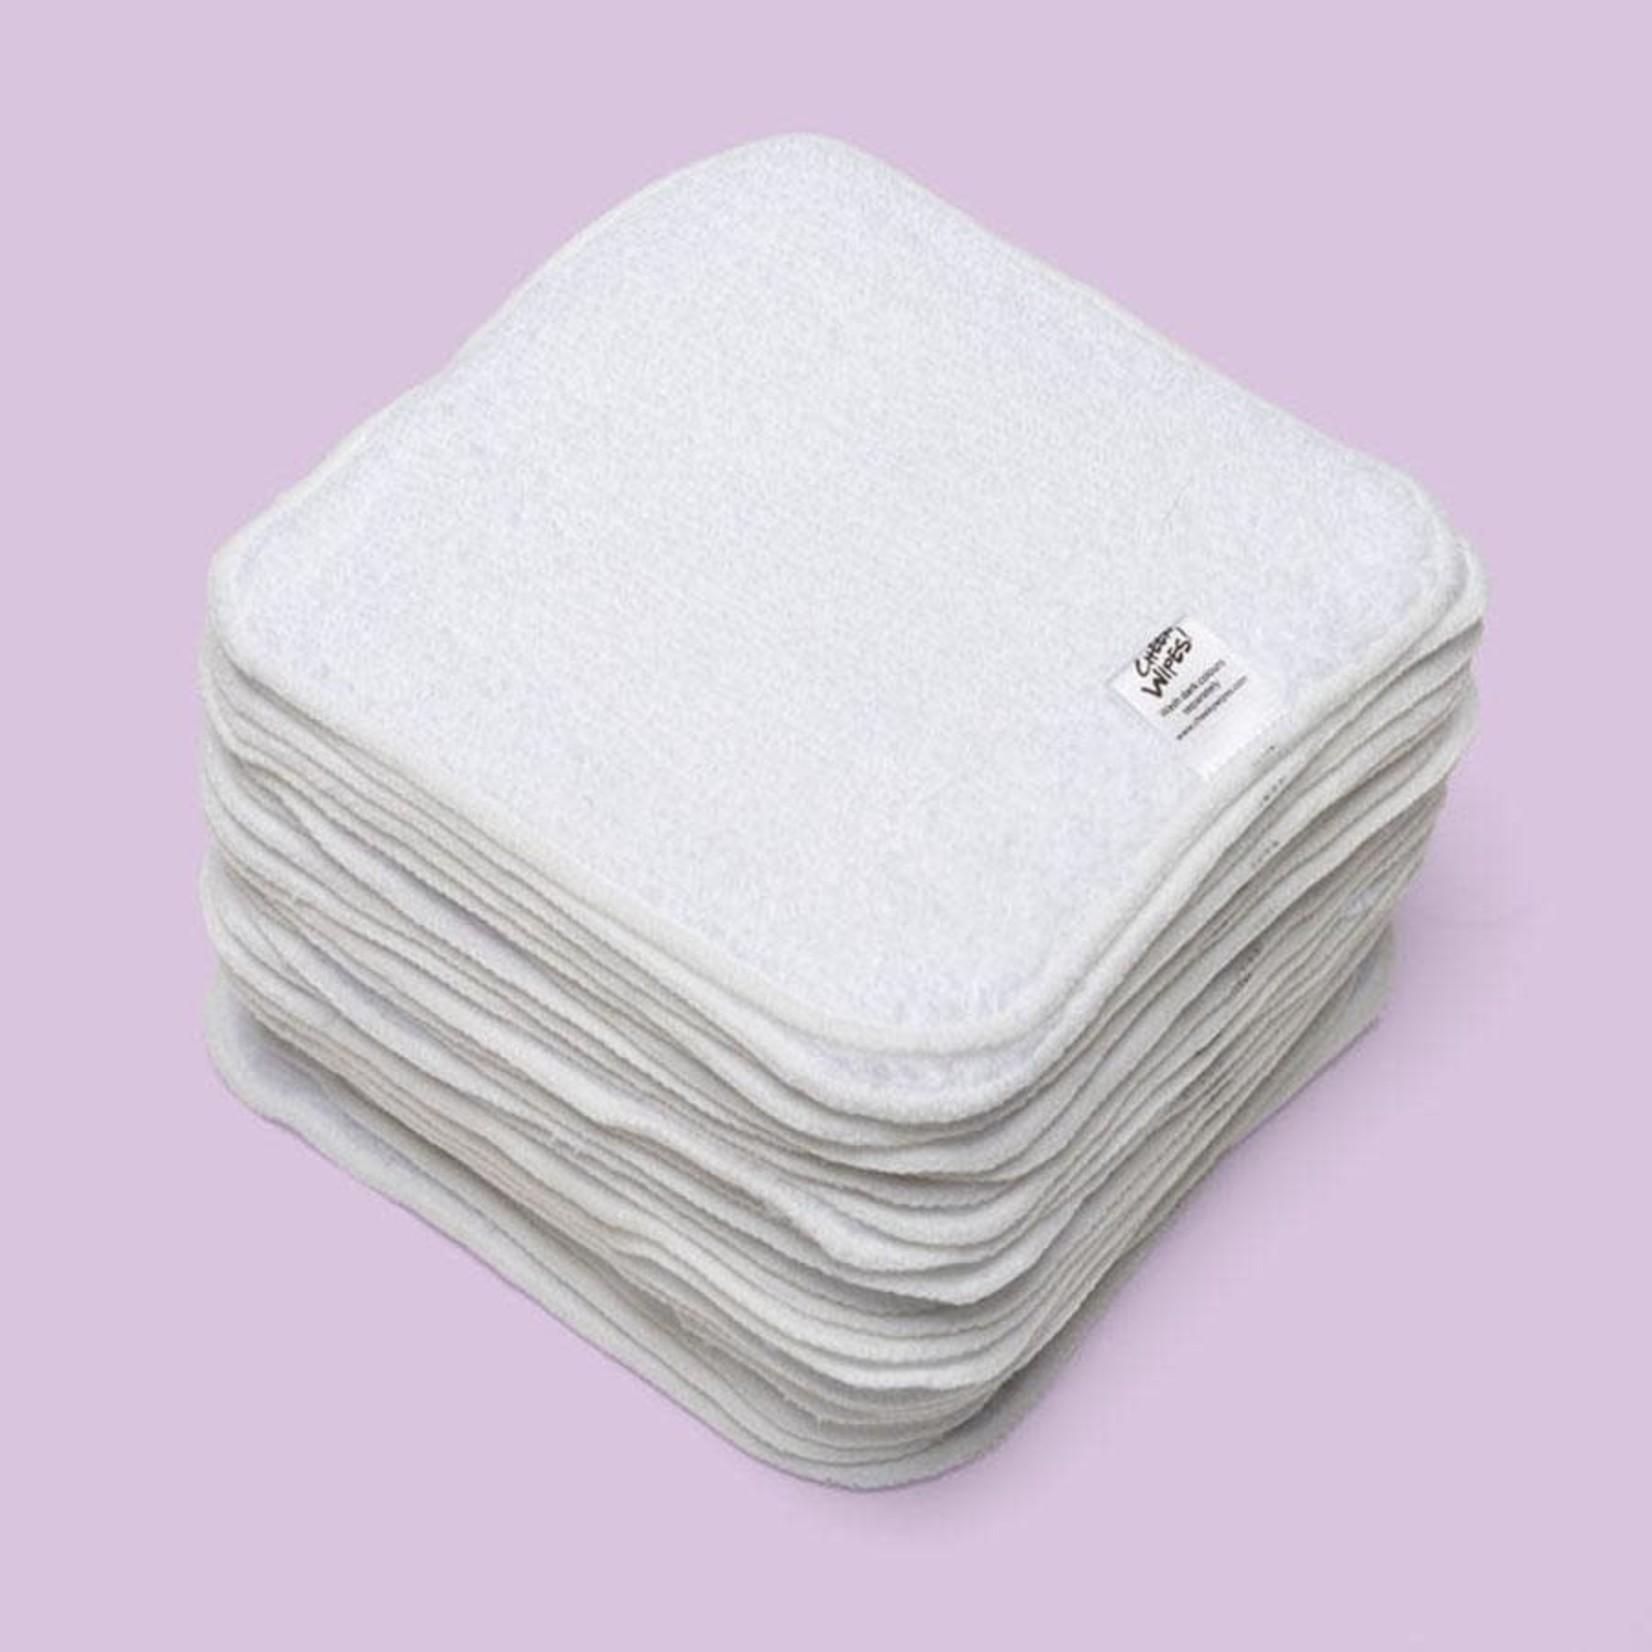 Cheeky Wipes 25 wasbare doekjes PREMIUM katoen wit